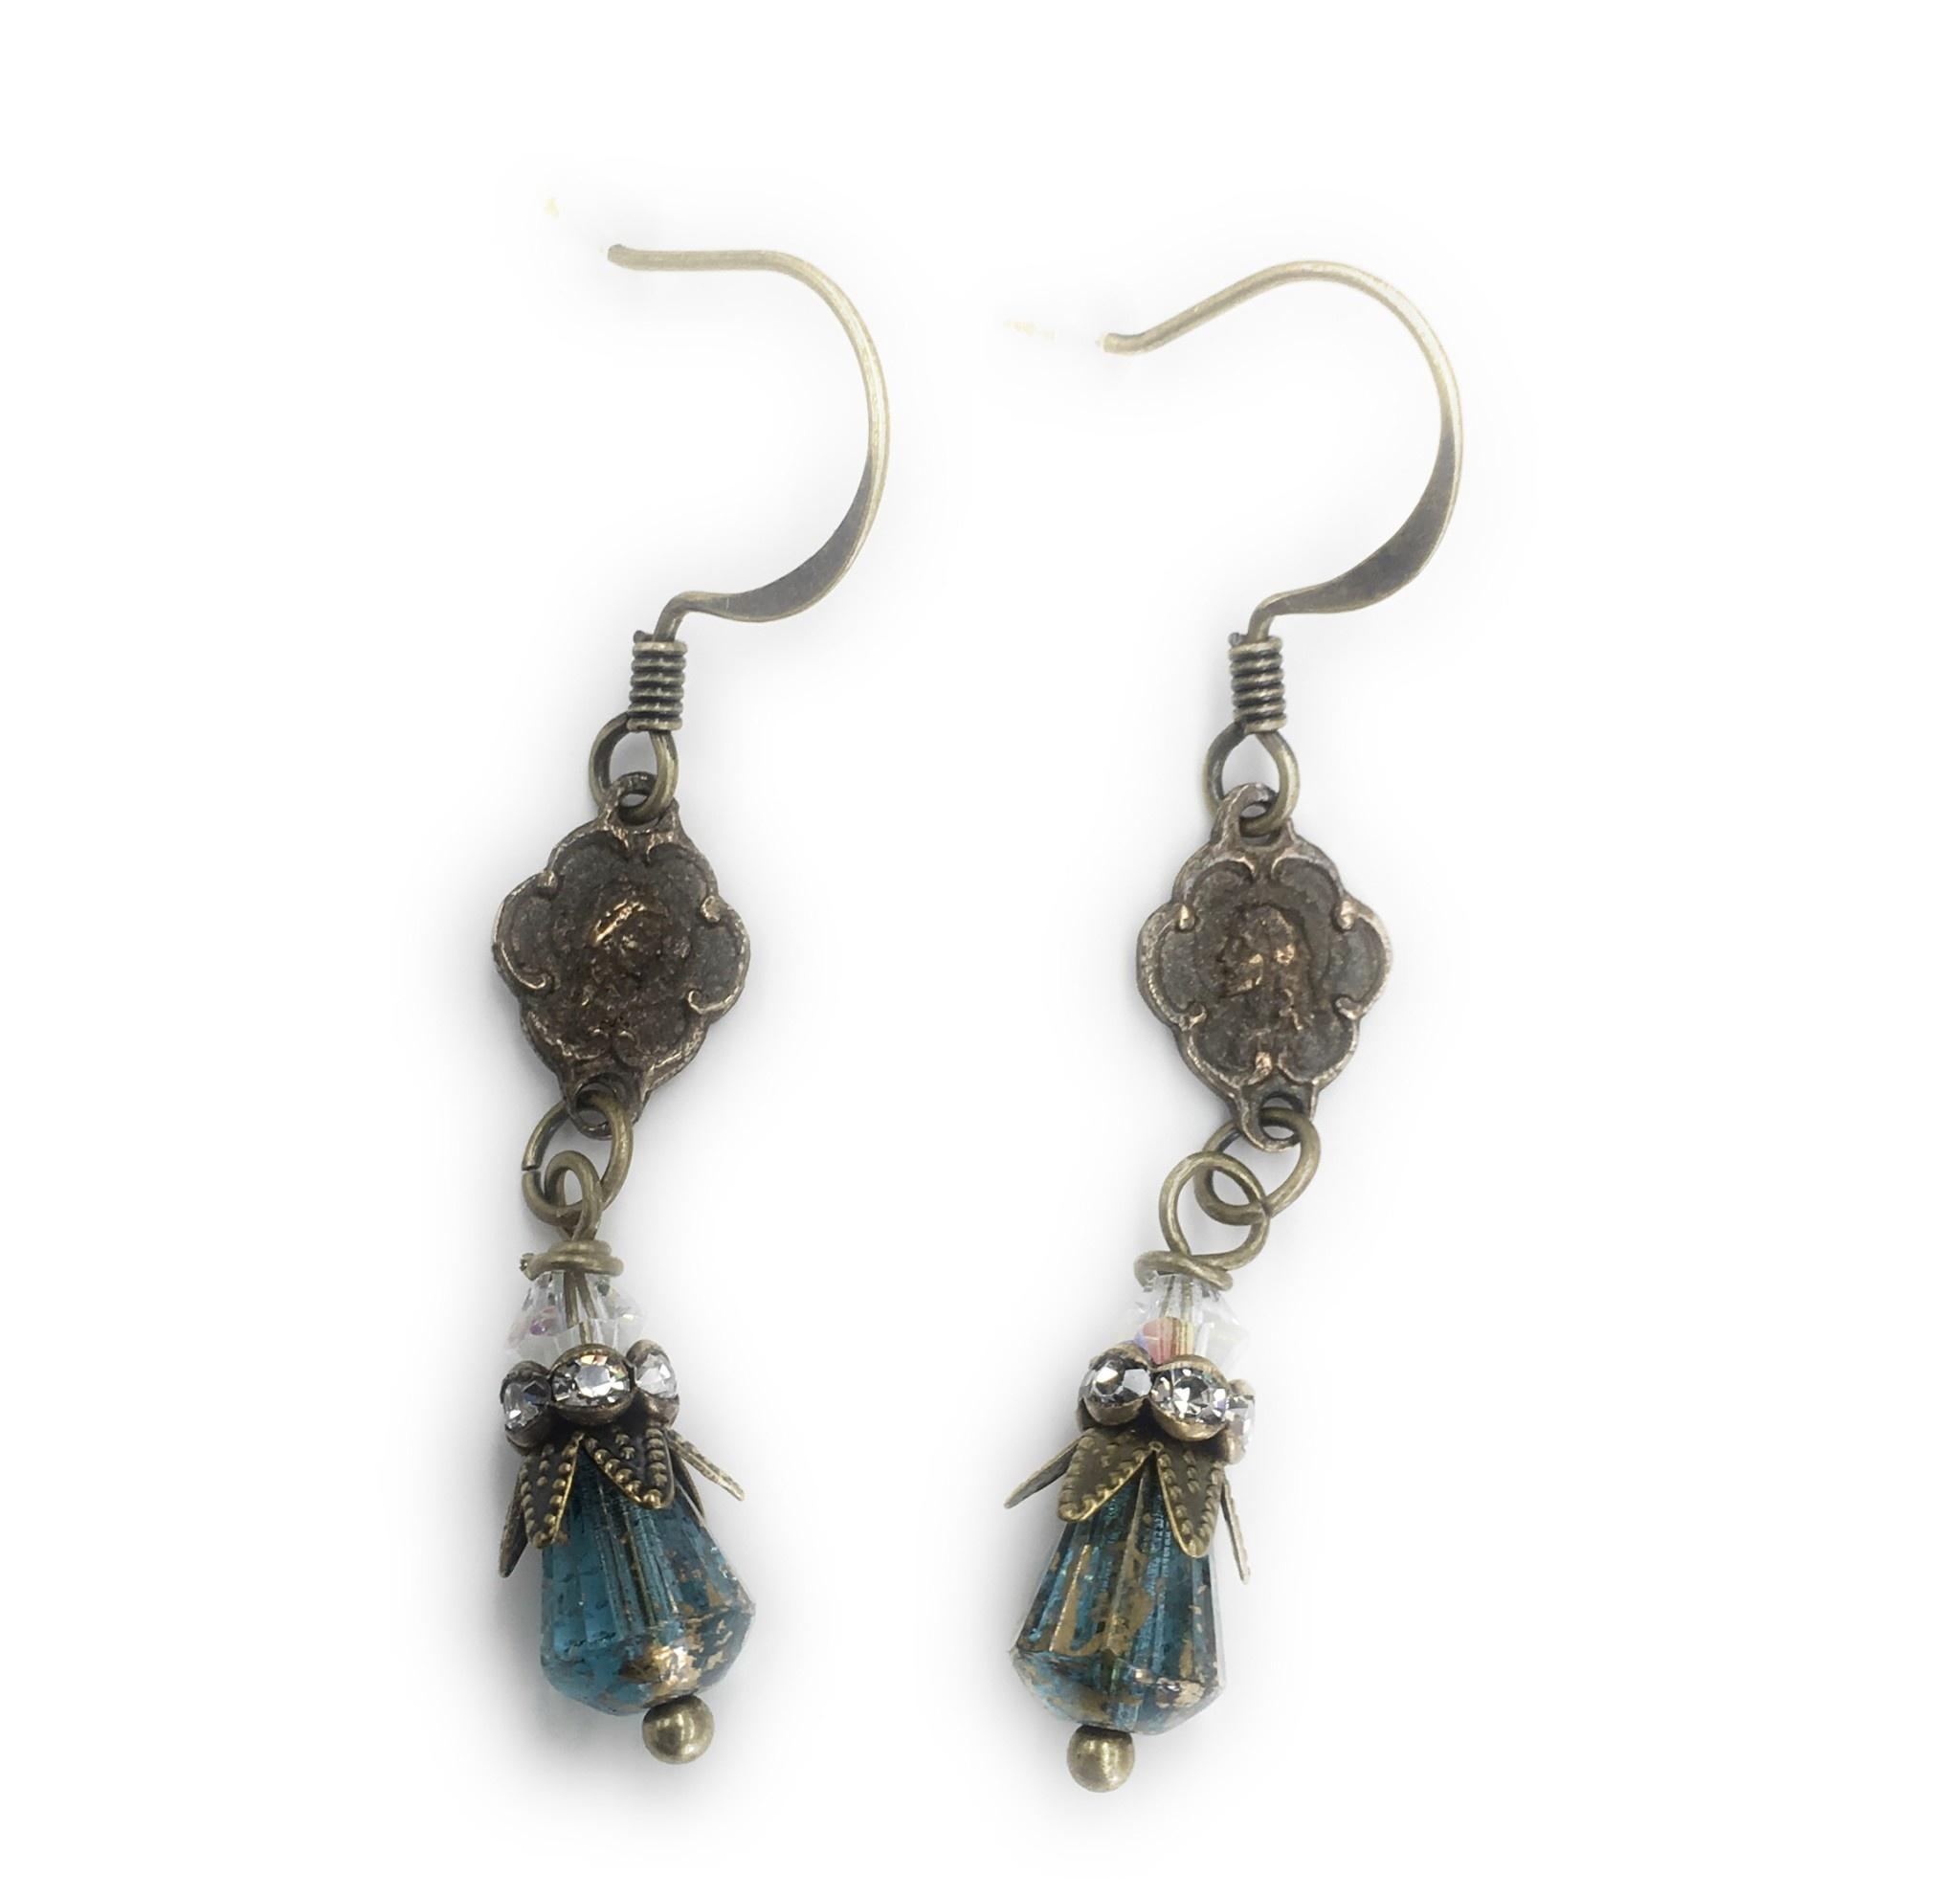 Gail's Design Vintage Mary Earrings